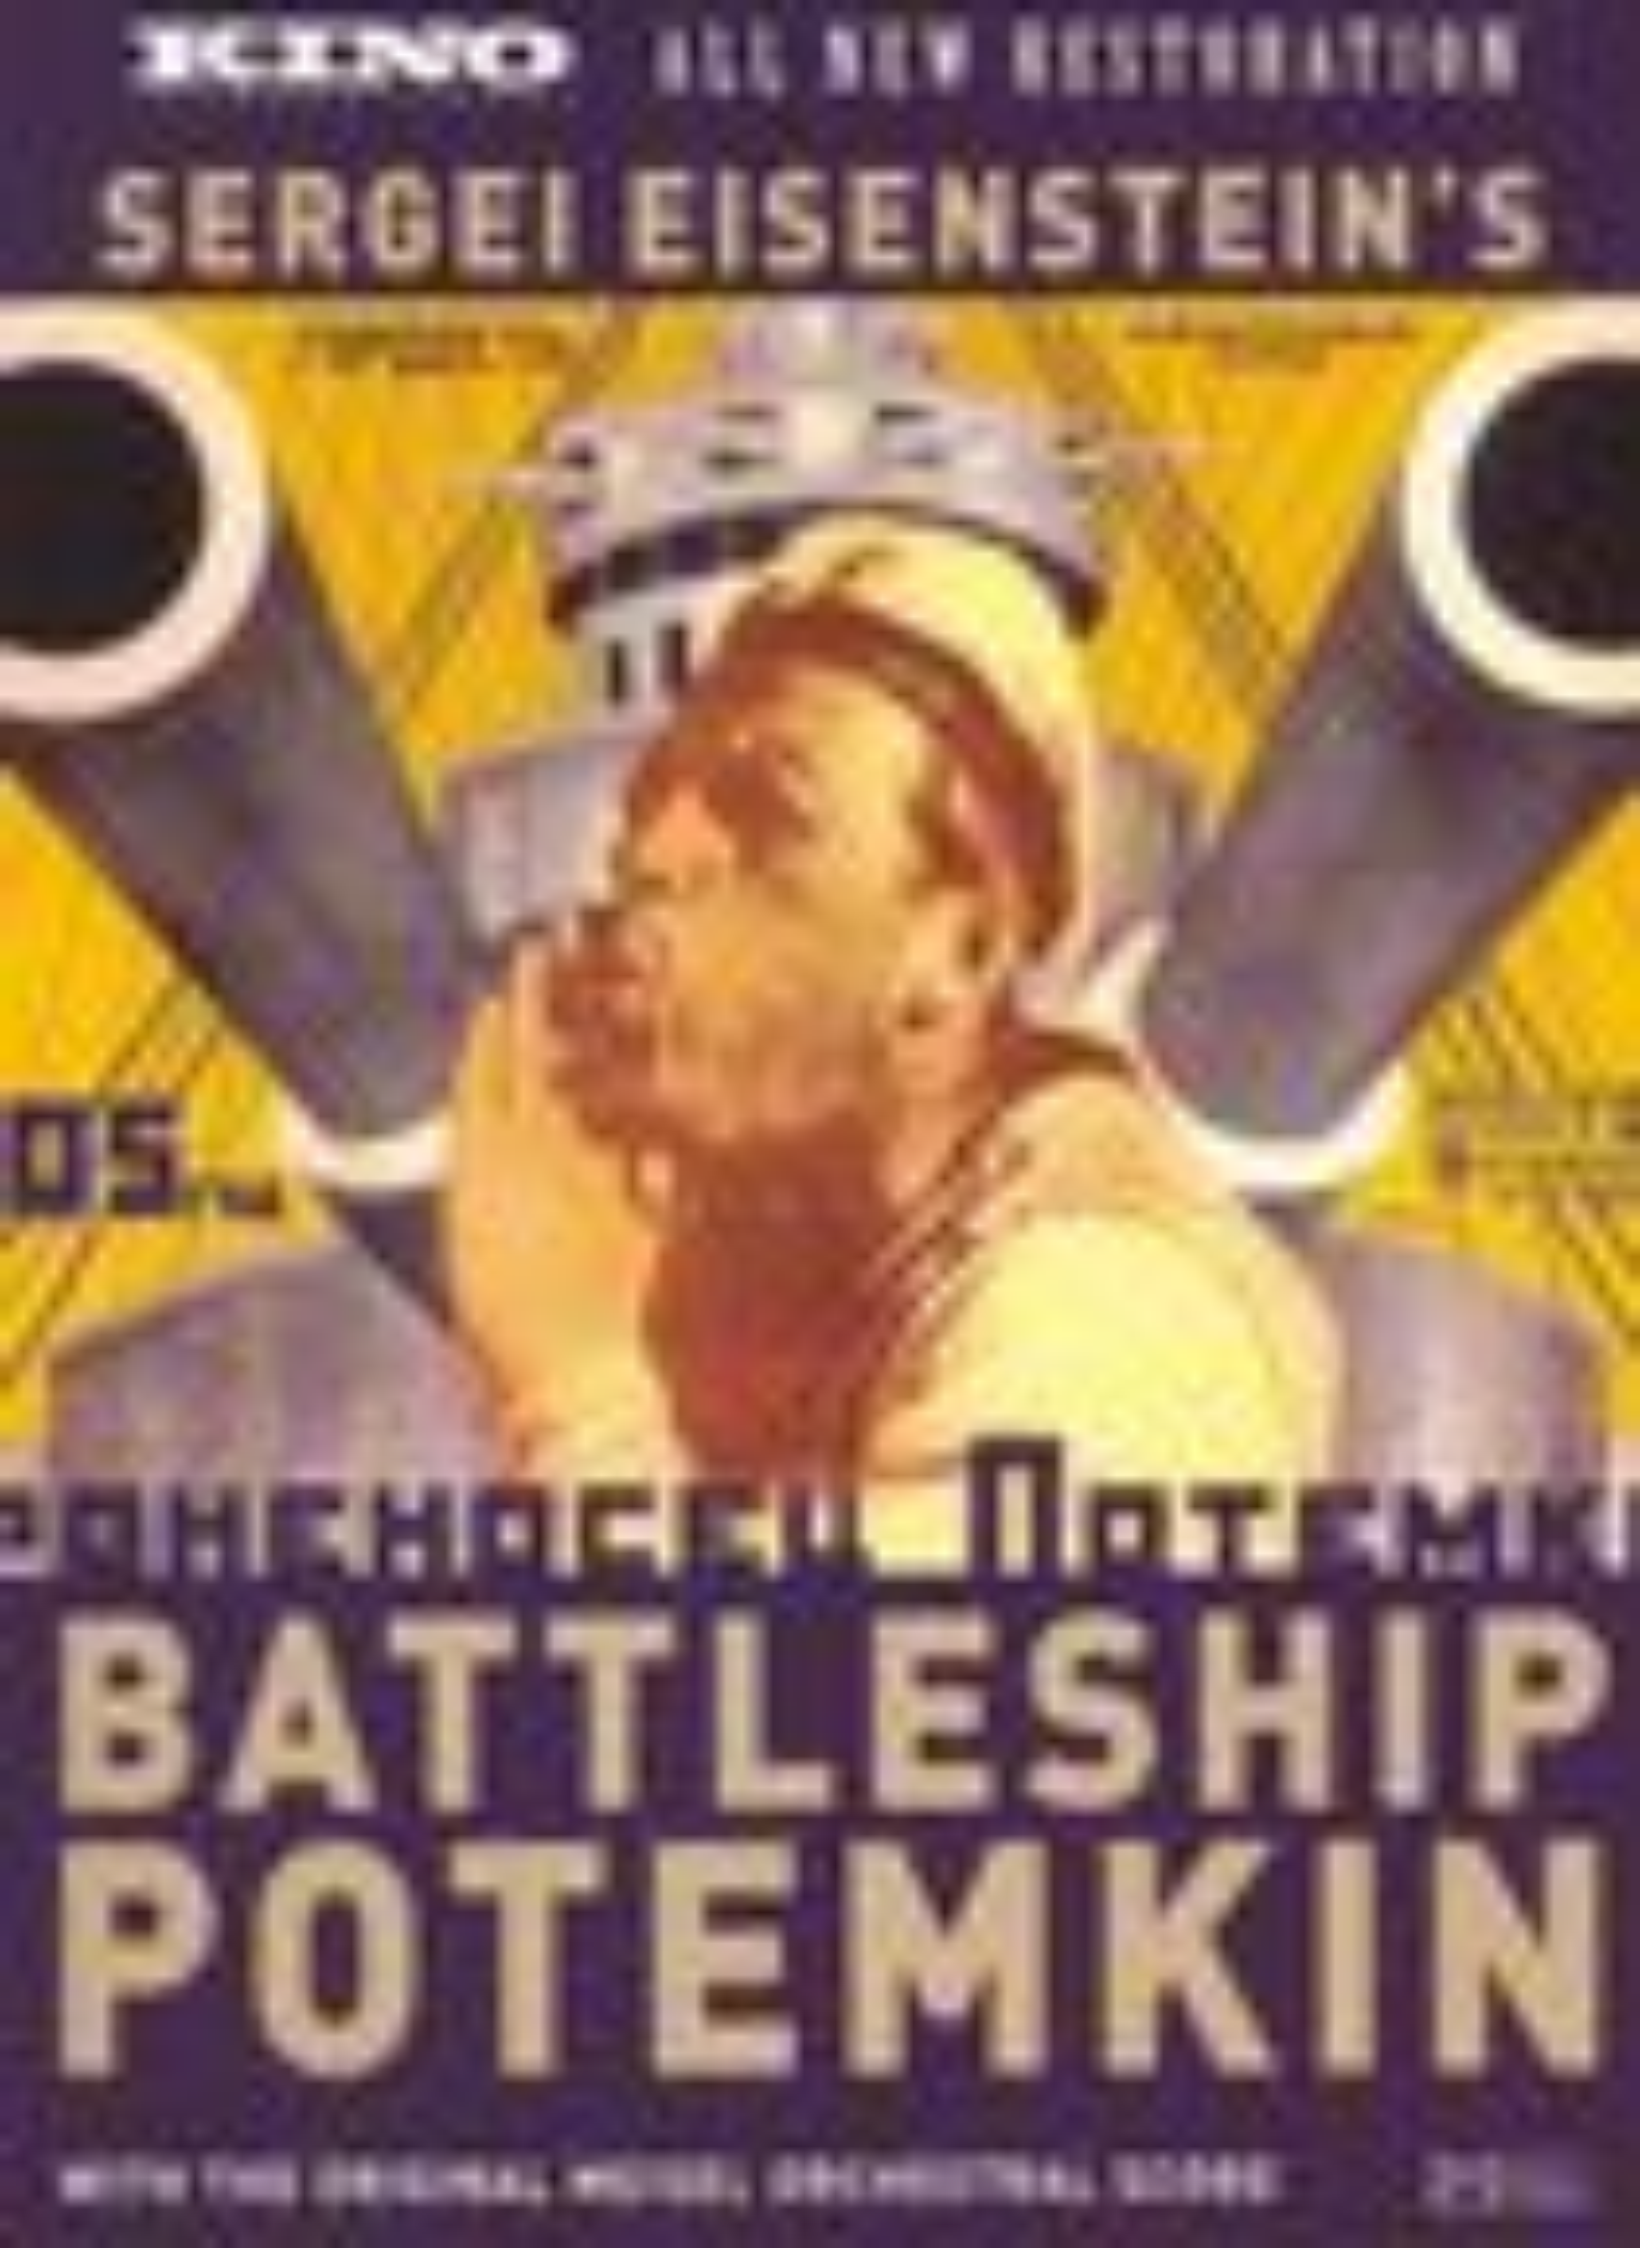 Battleship Potemkin [2 Discs] (dvd) 15918553